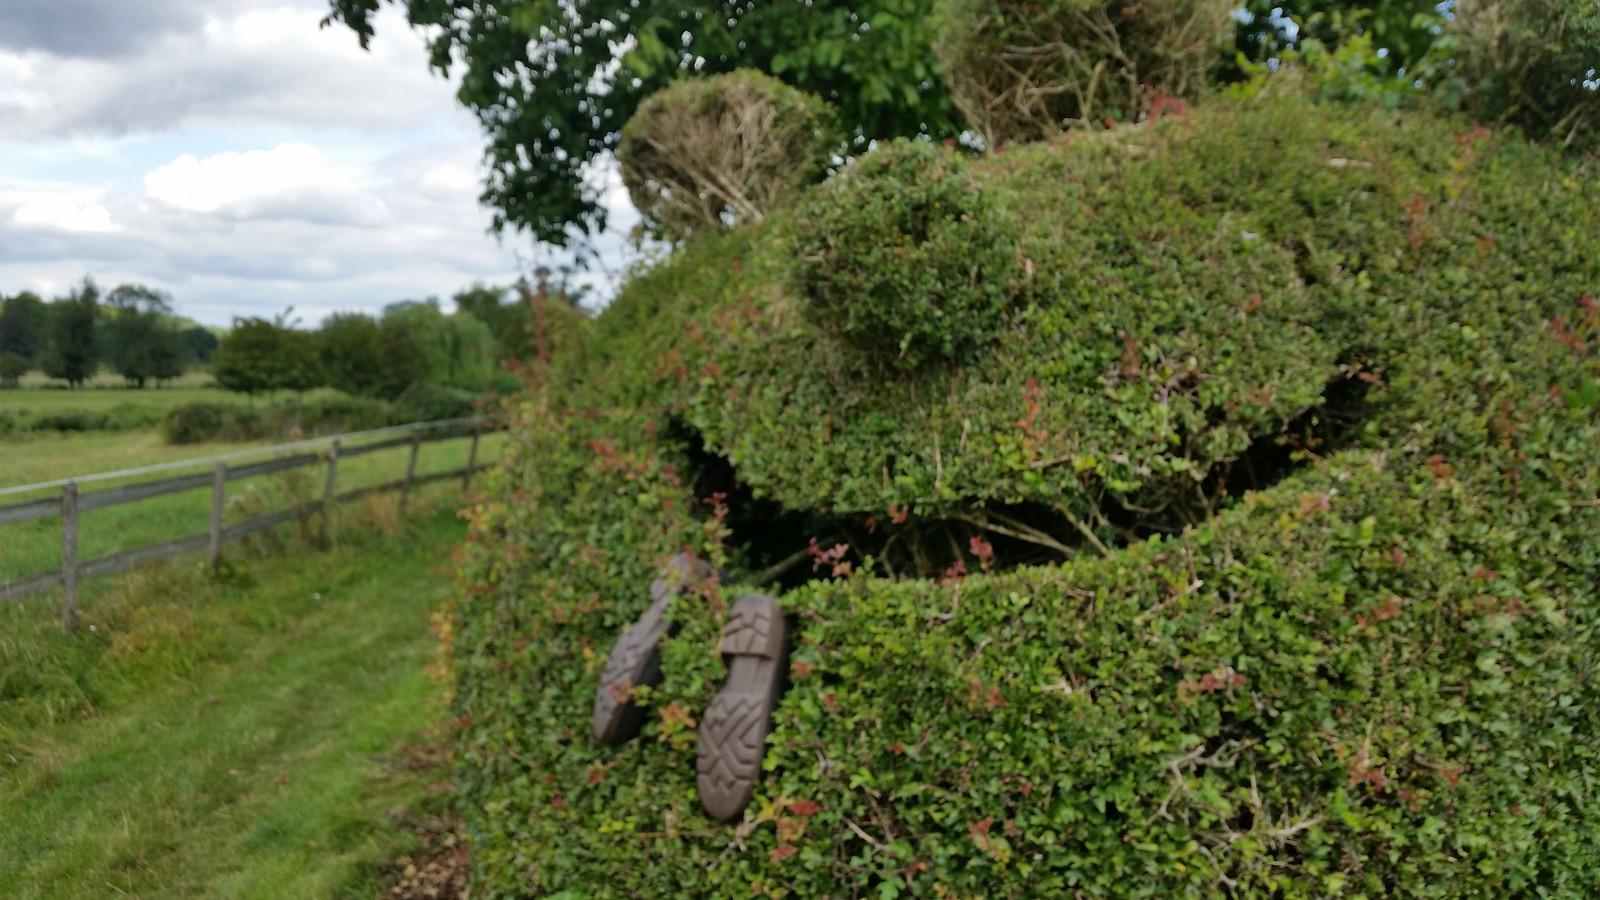 Midsomer murders walk, Henley circular via Turville